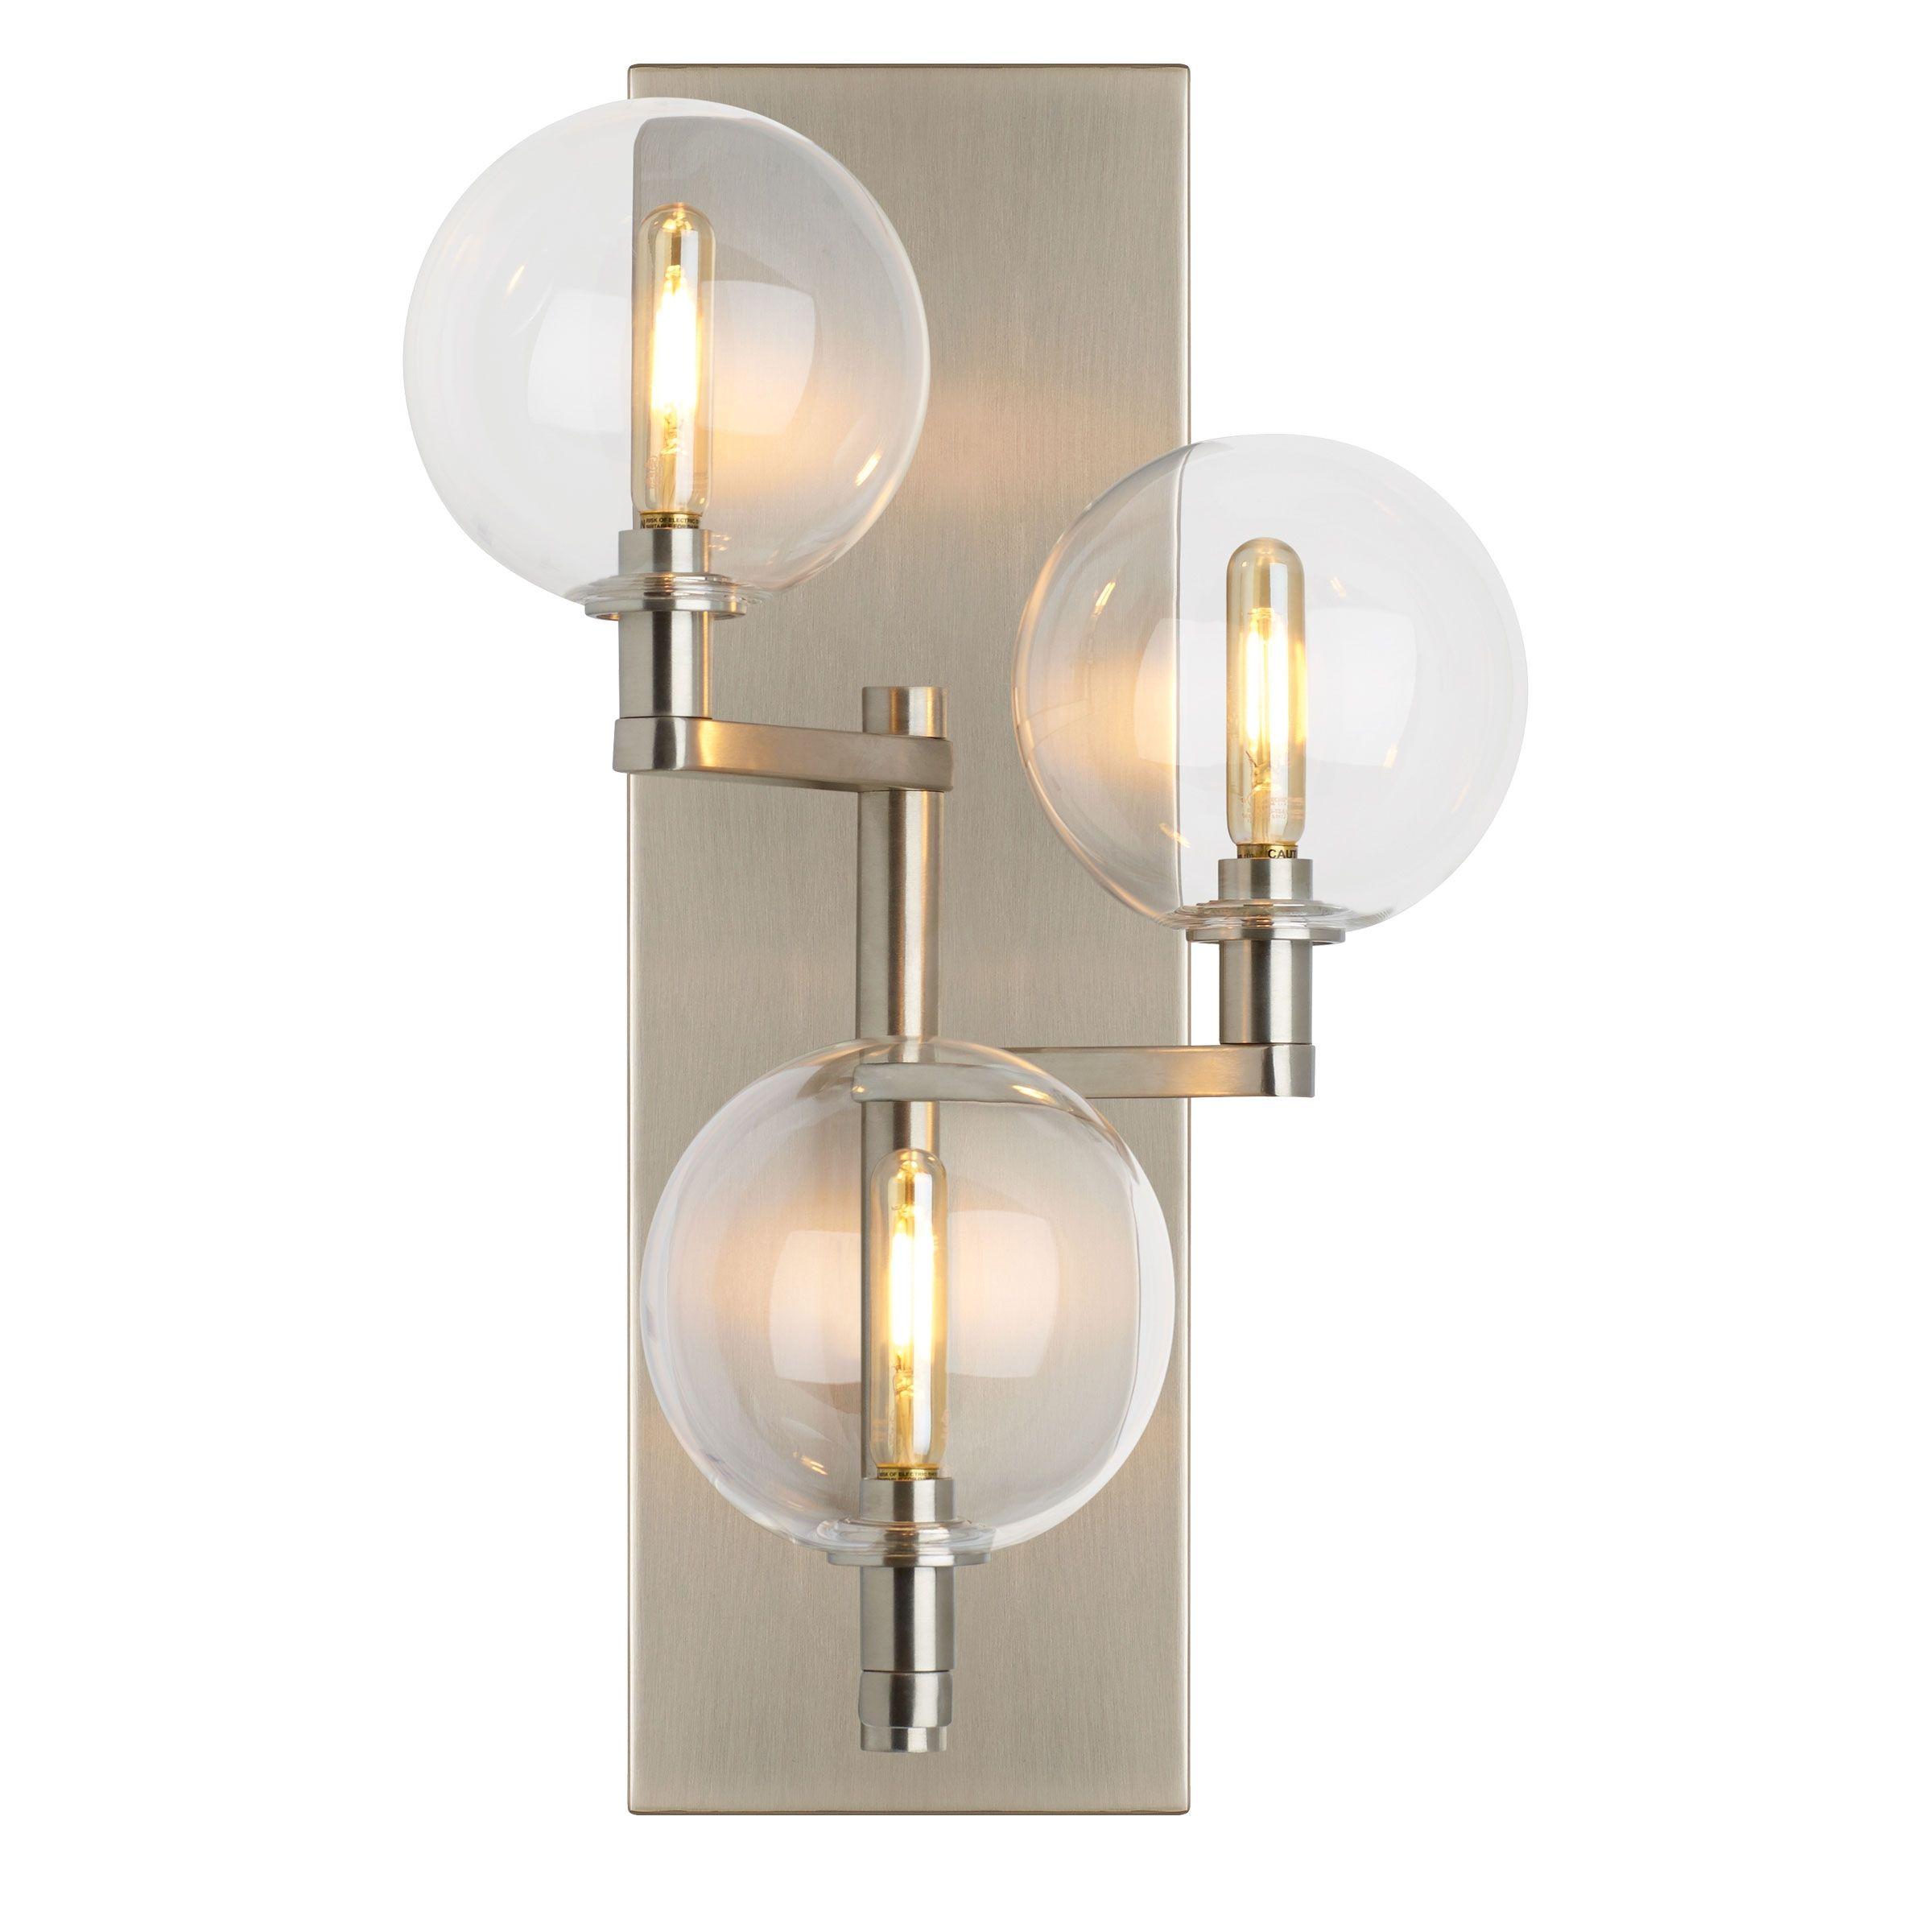 Bathroom Lighting Color Temperature gambit triple wall light | light tech, color temperature and